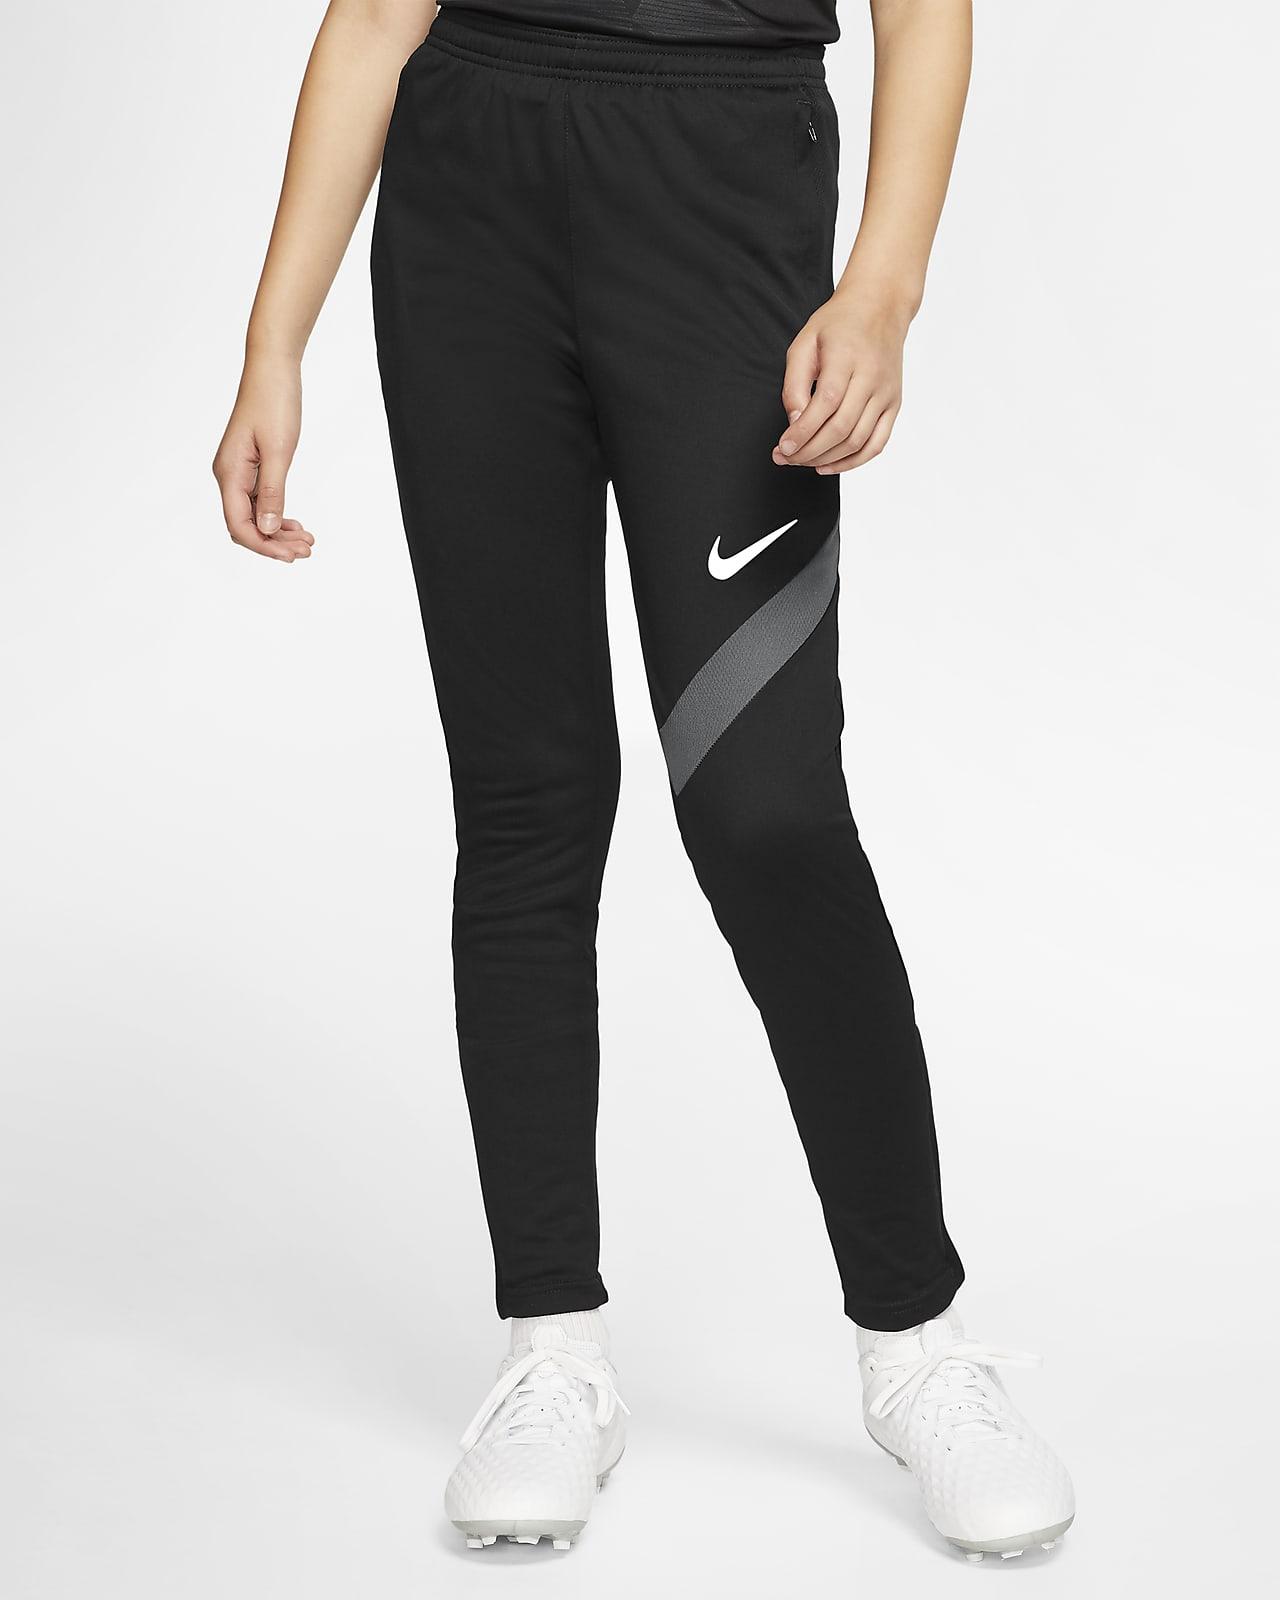 Fotbollsbyxor Nike Dri-FIT Academy Pro för ungdom